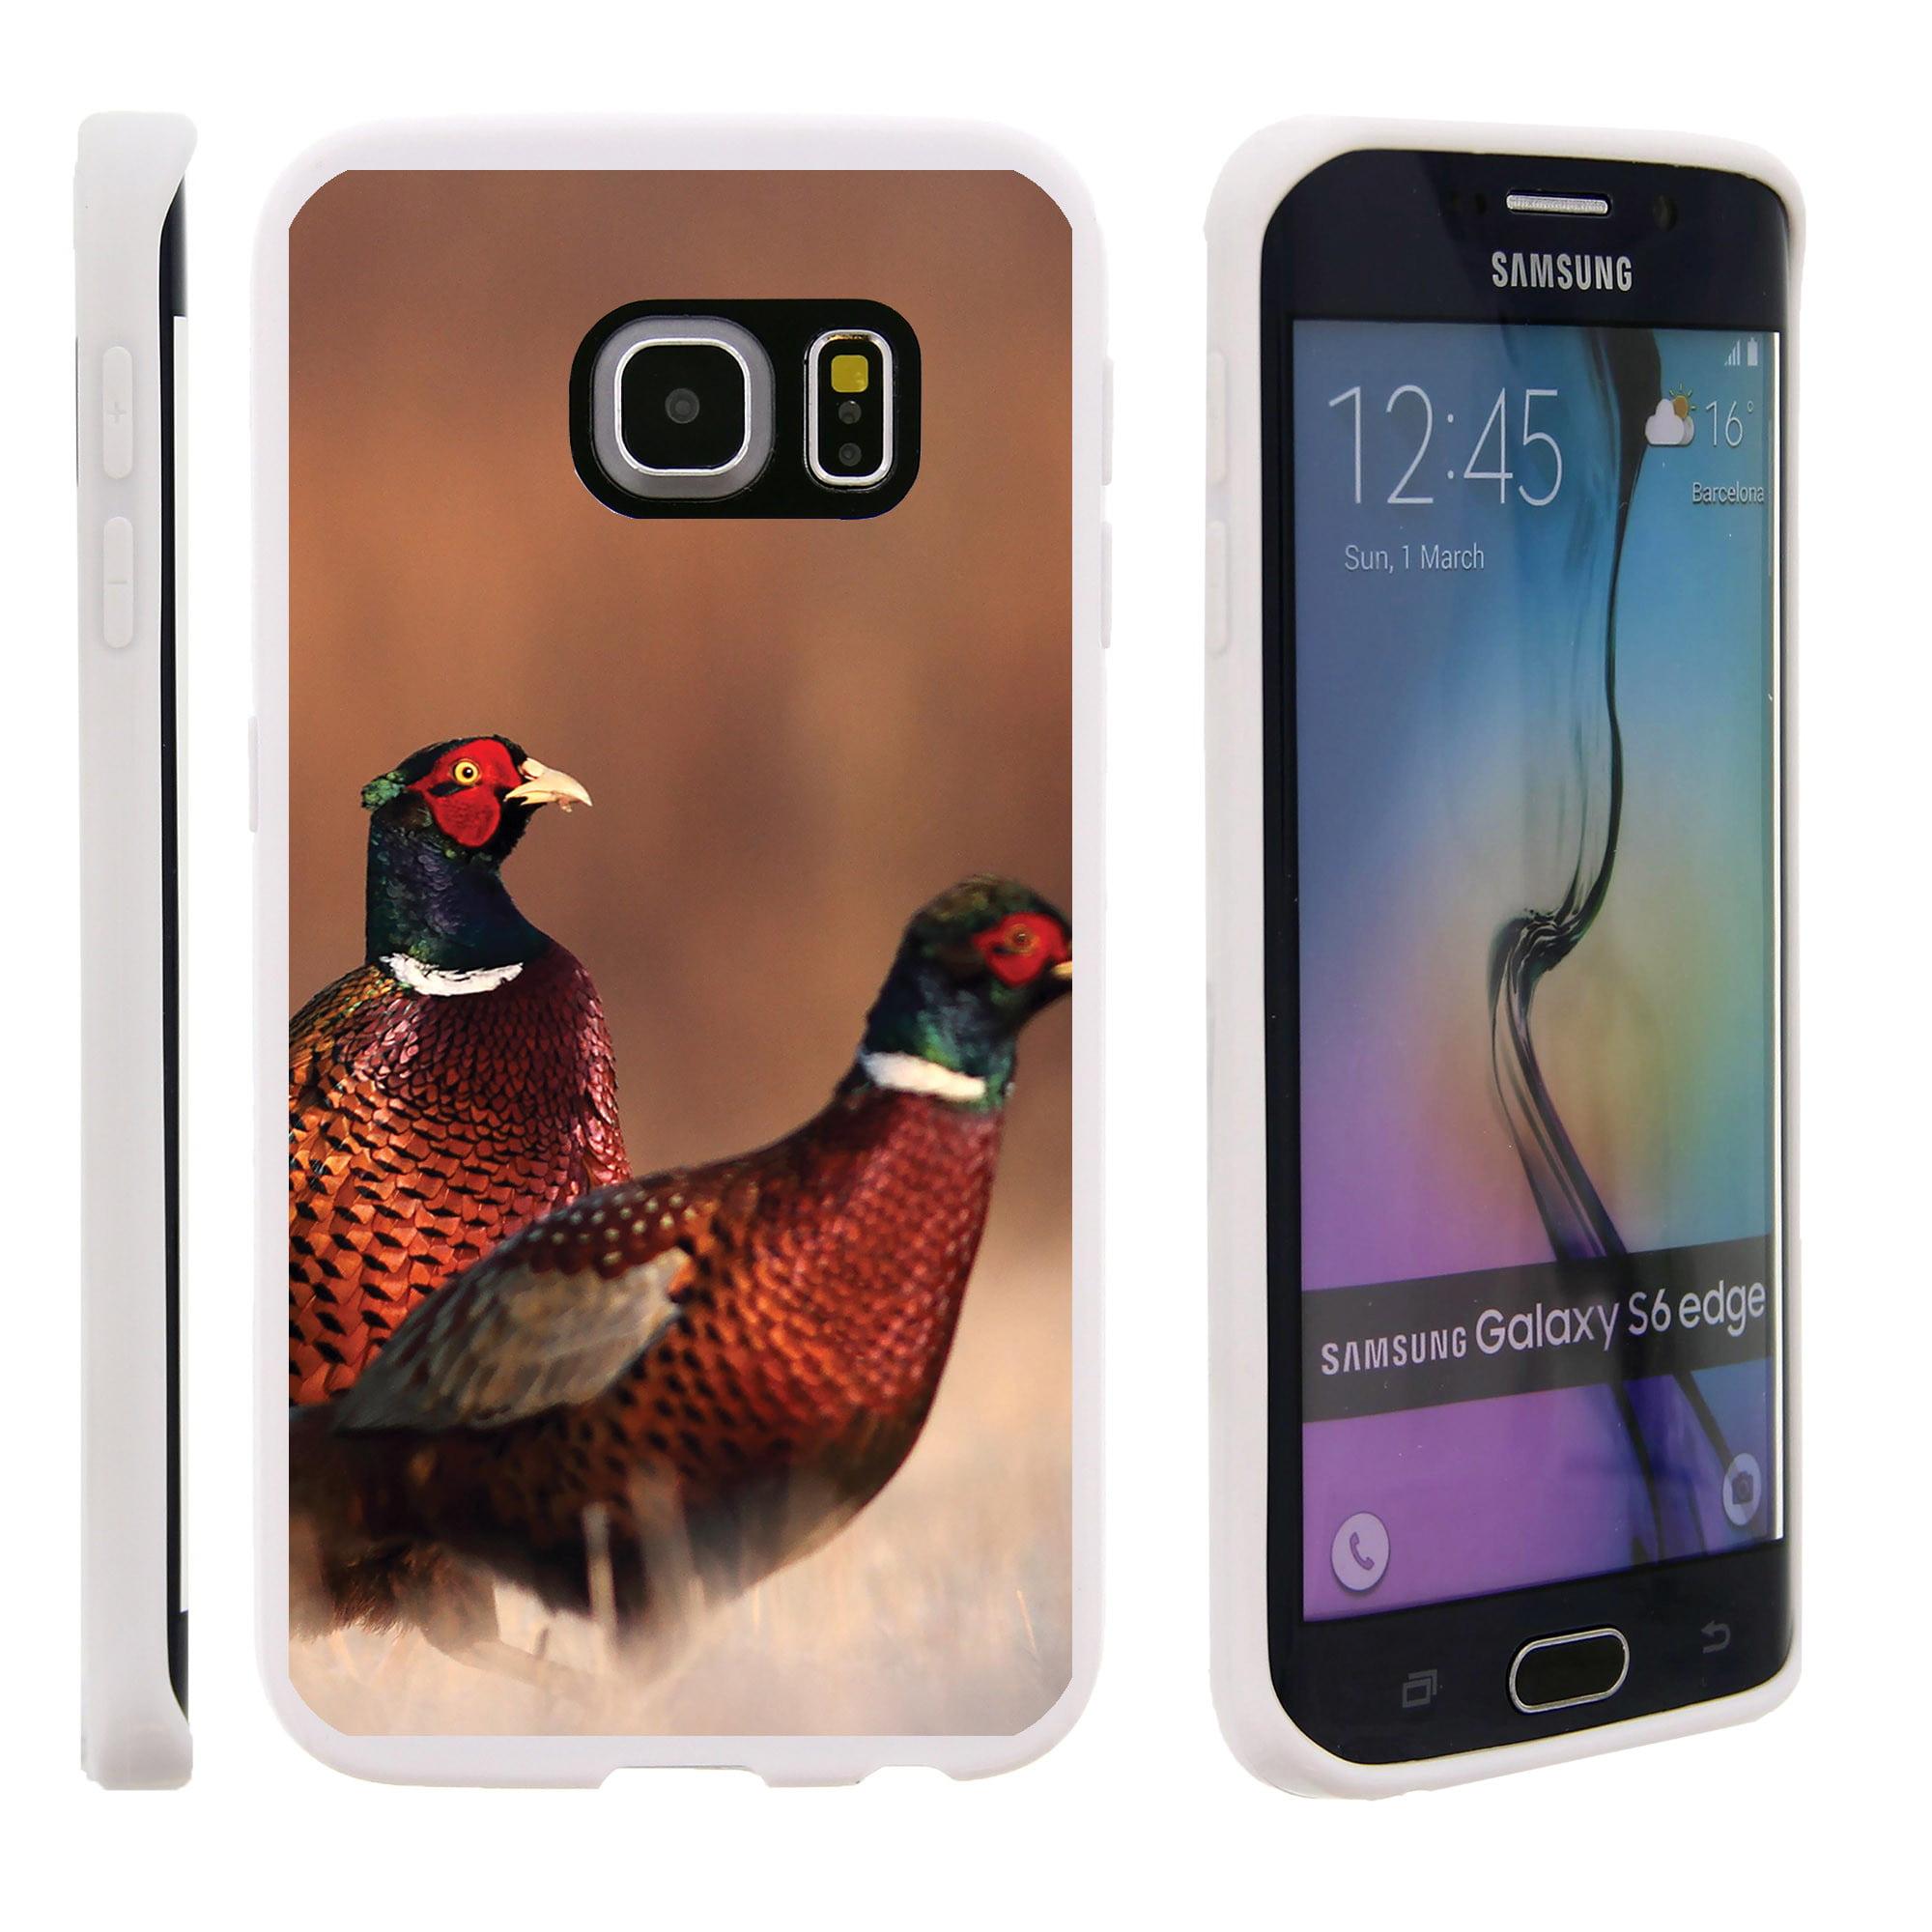 Samsung Galaxy S6 Edge G925, Flexible Case [FLEX FORCE] Slim Durable TPU Sleek Bumper with Unique Designs - Red and Green Birds